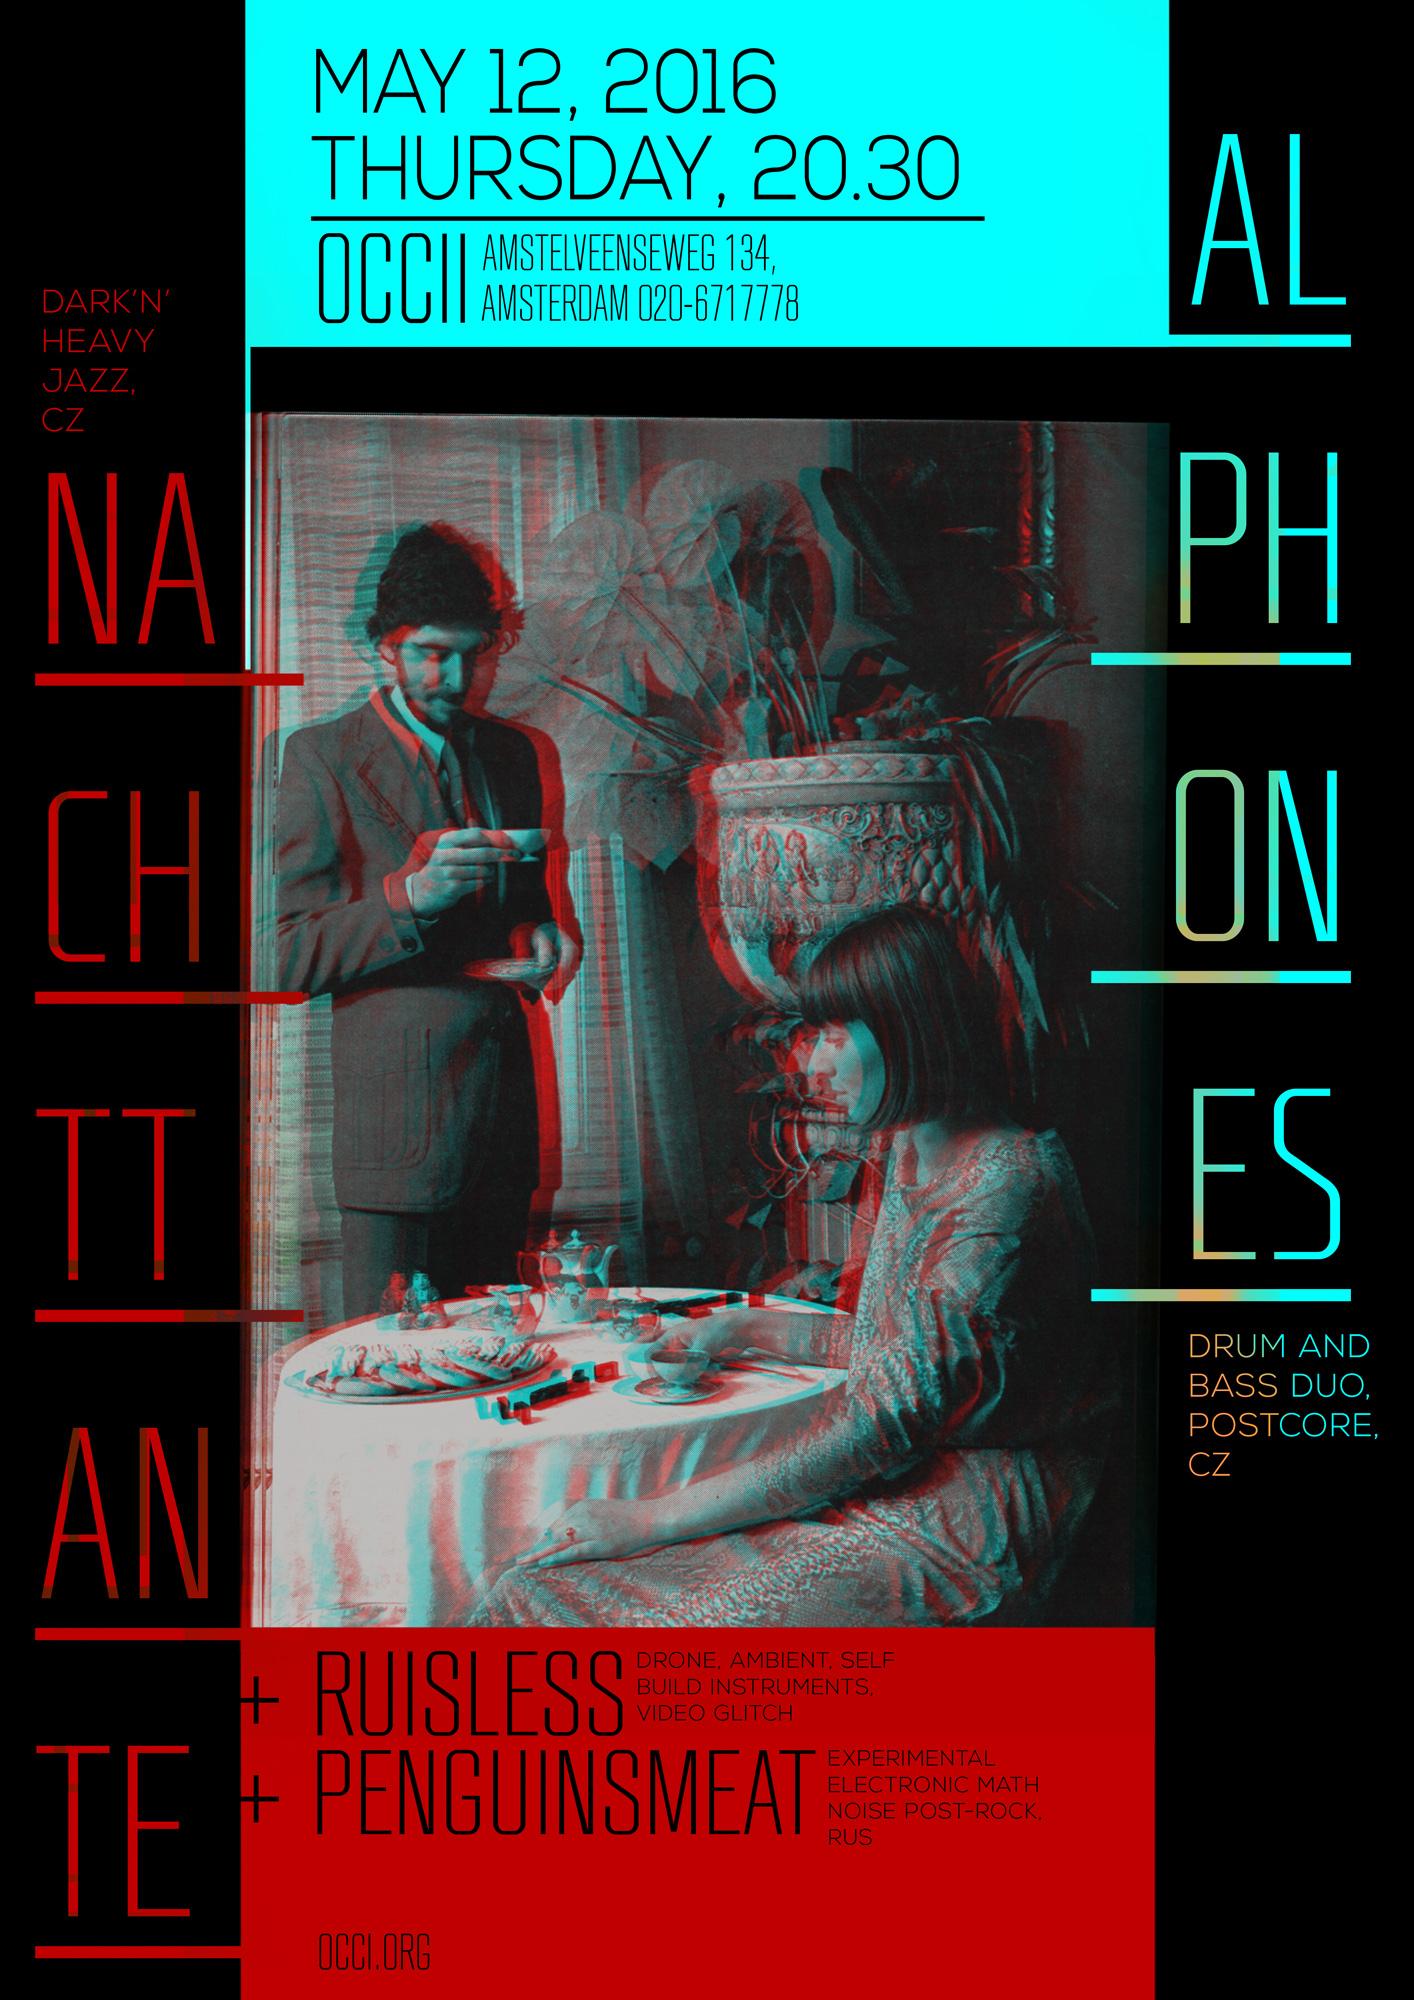 NACHTTANTE (cz) + ALPHONES (cz) + RUISLESS